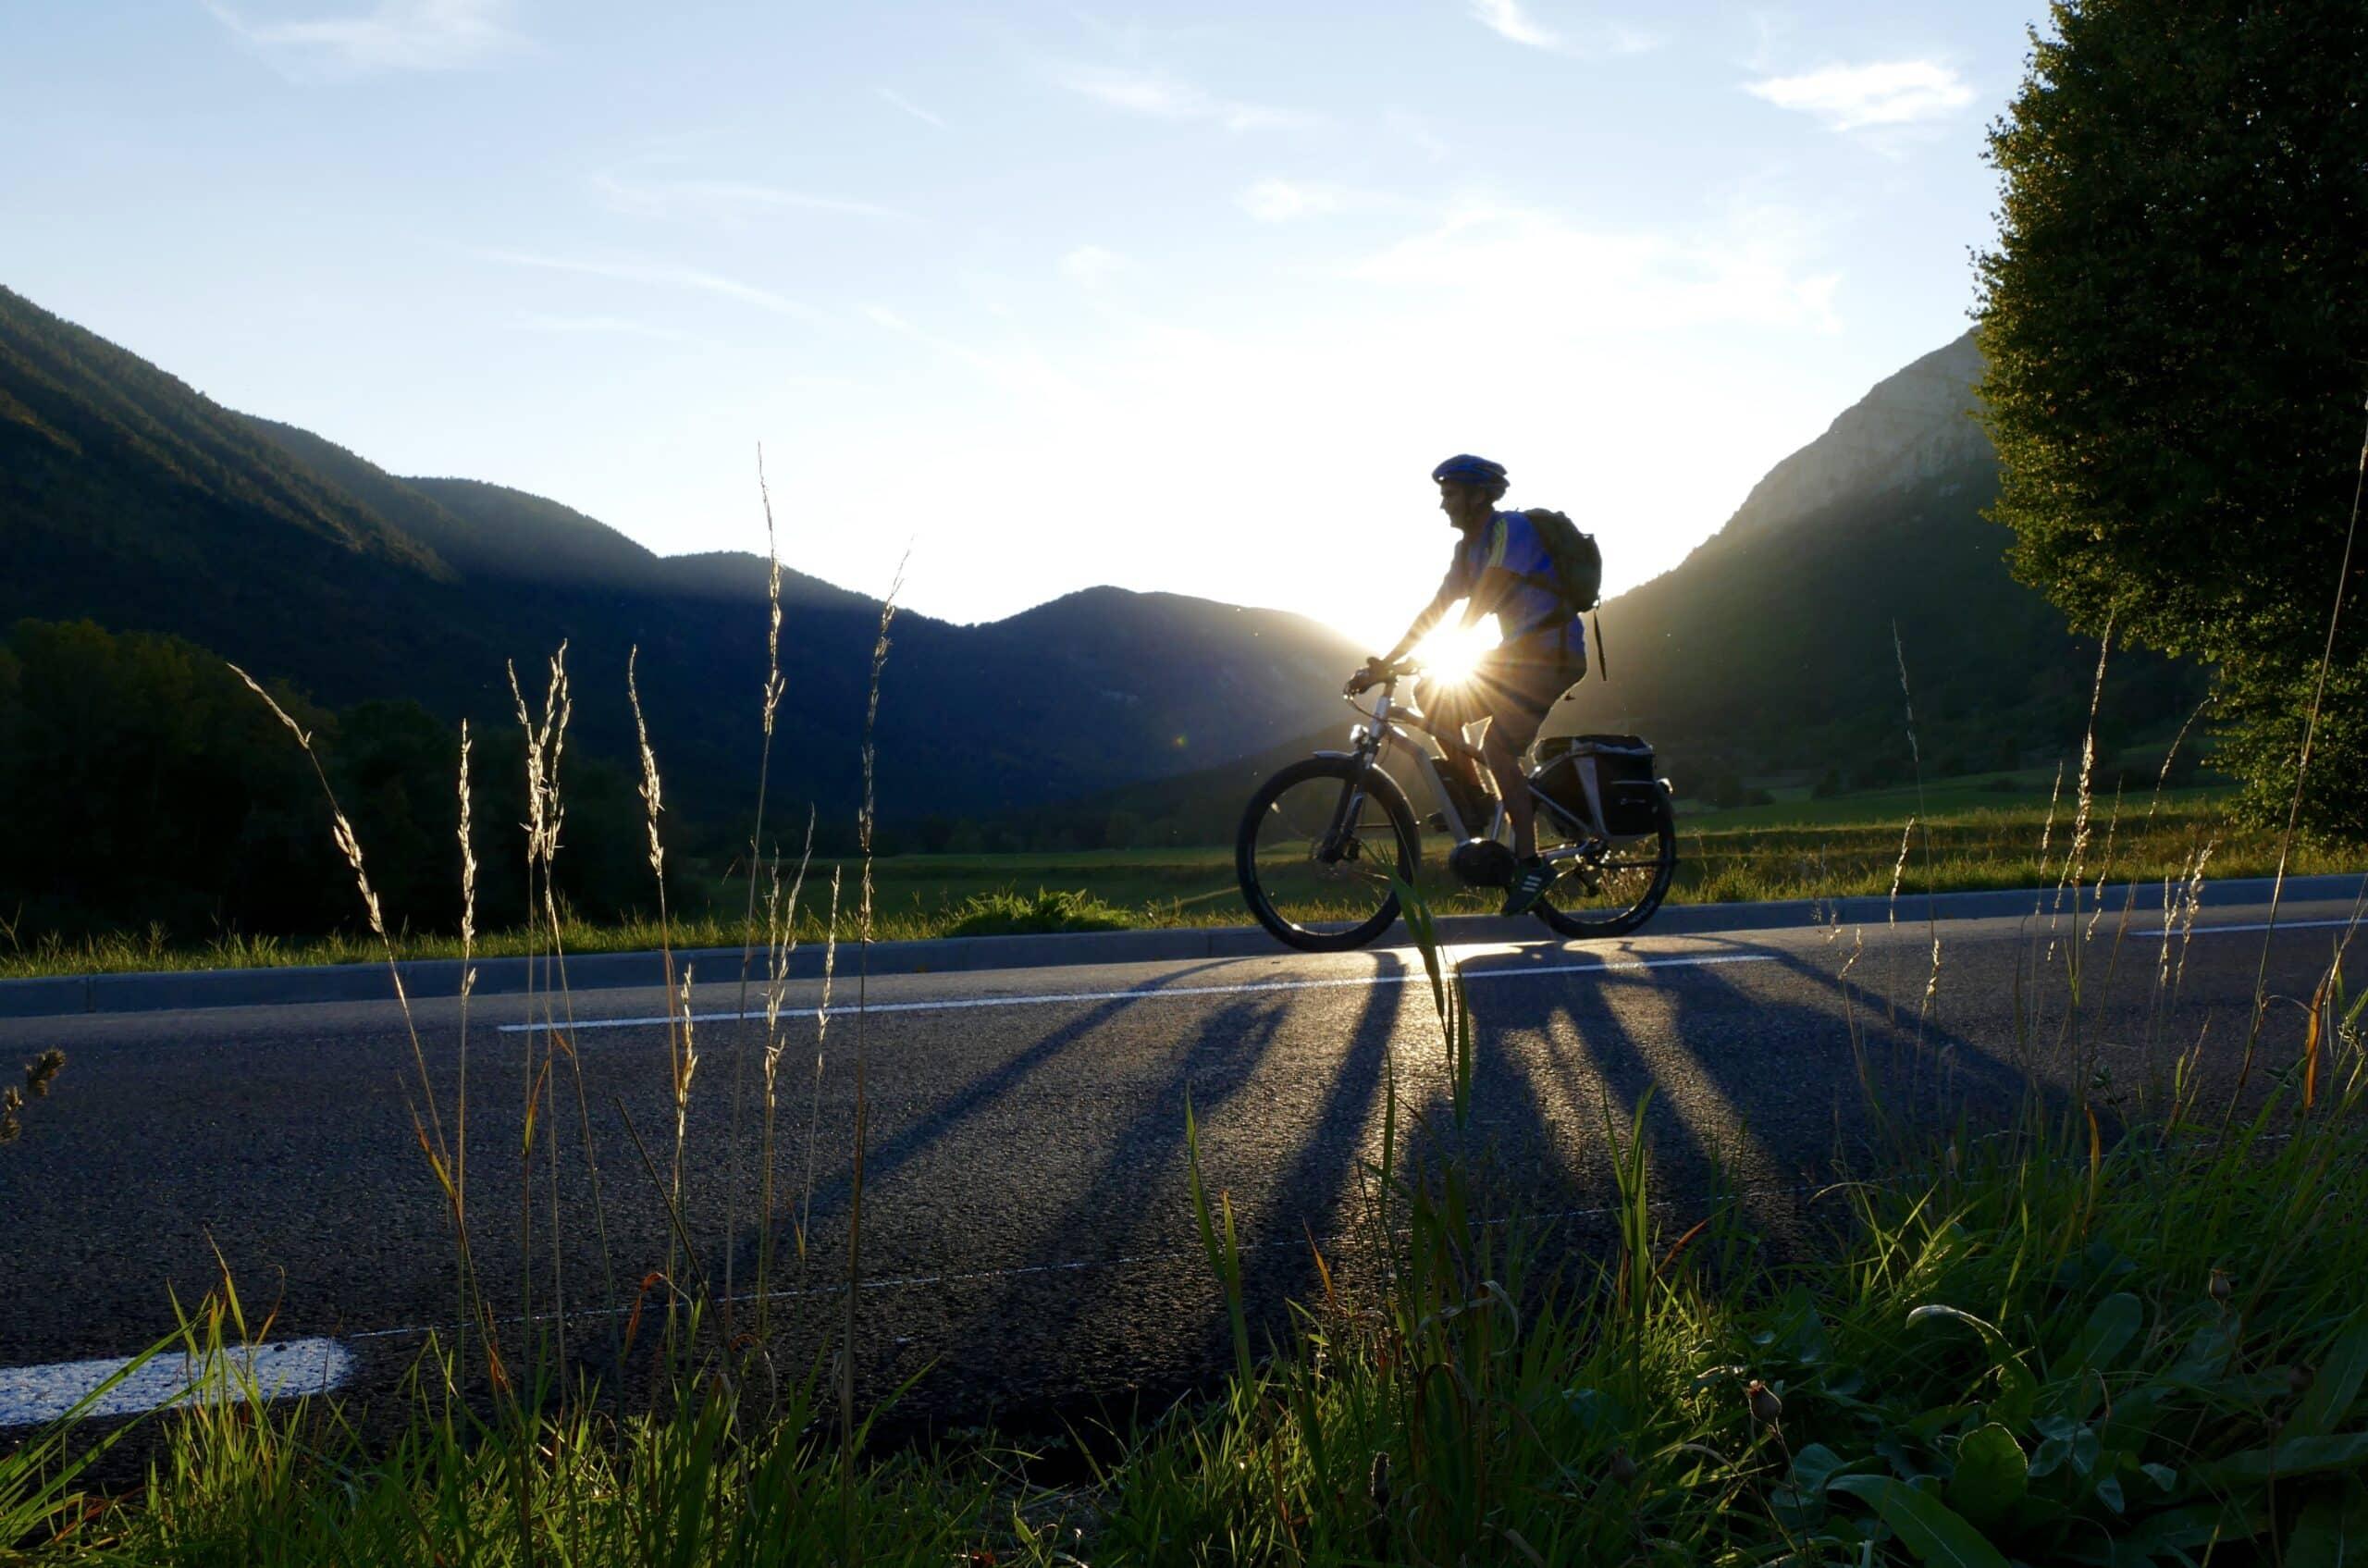 Bedste10 bedste el-cykel